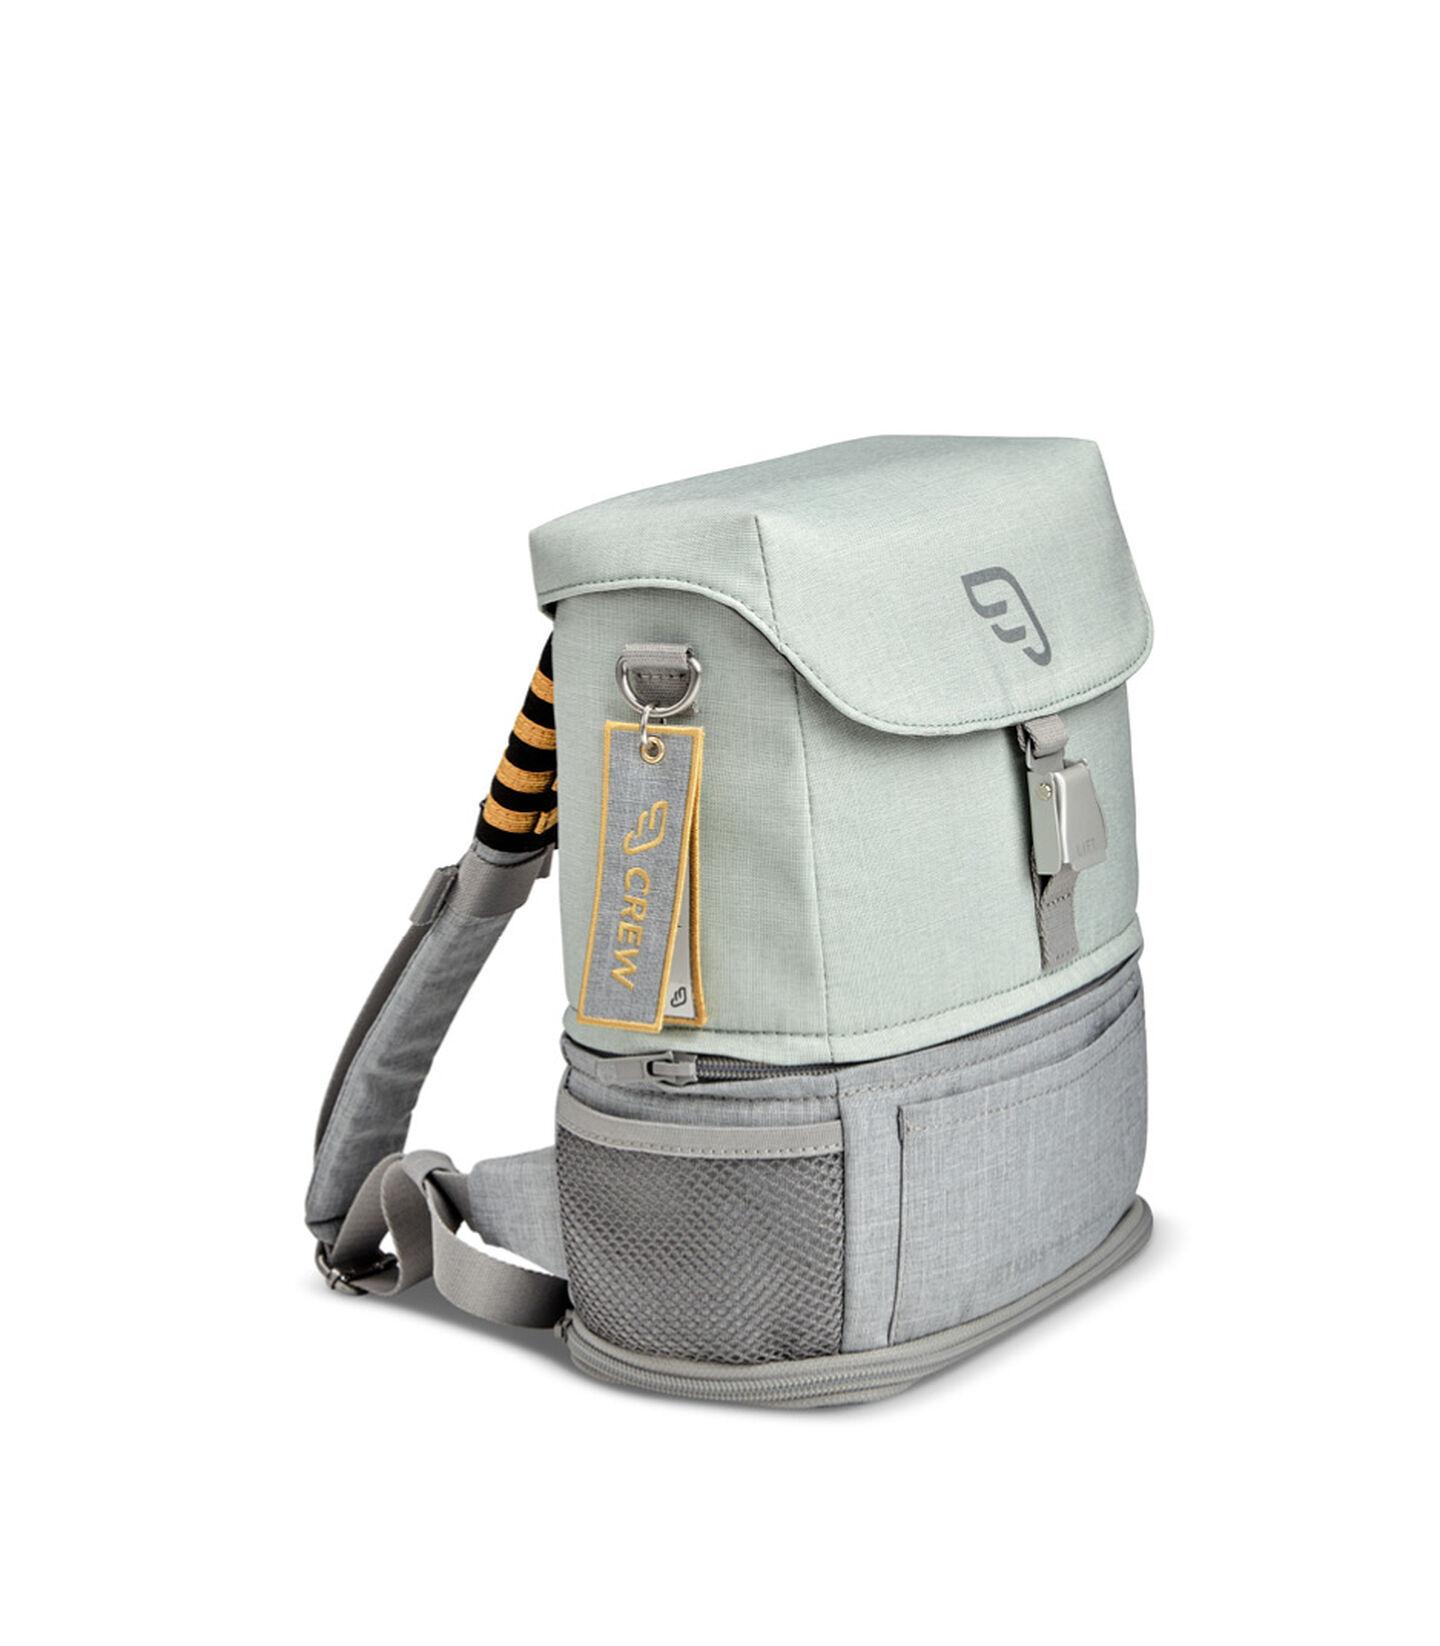 JetKids™ de Stokke® Crew Backpack Green Aurora, Green Aurora, mainview view 1